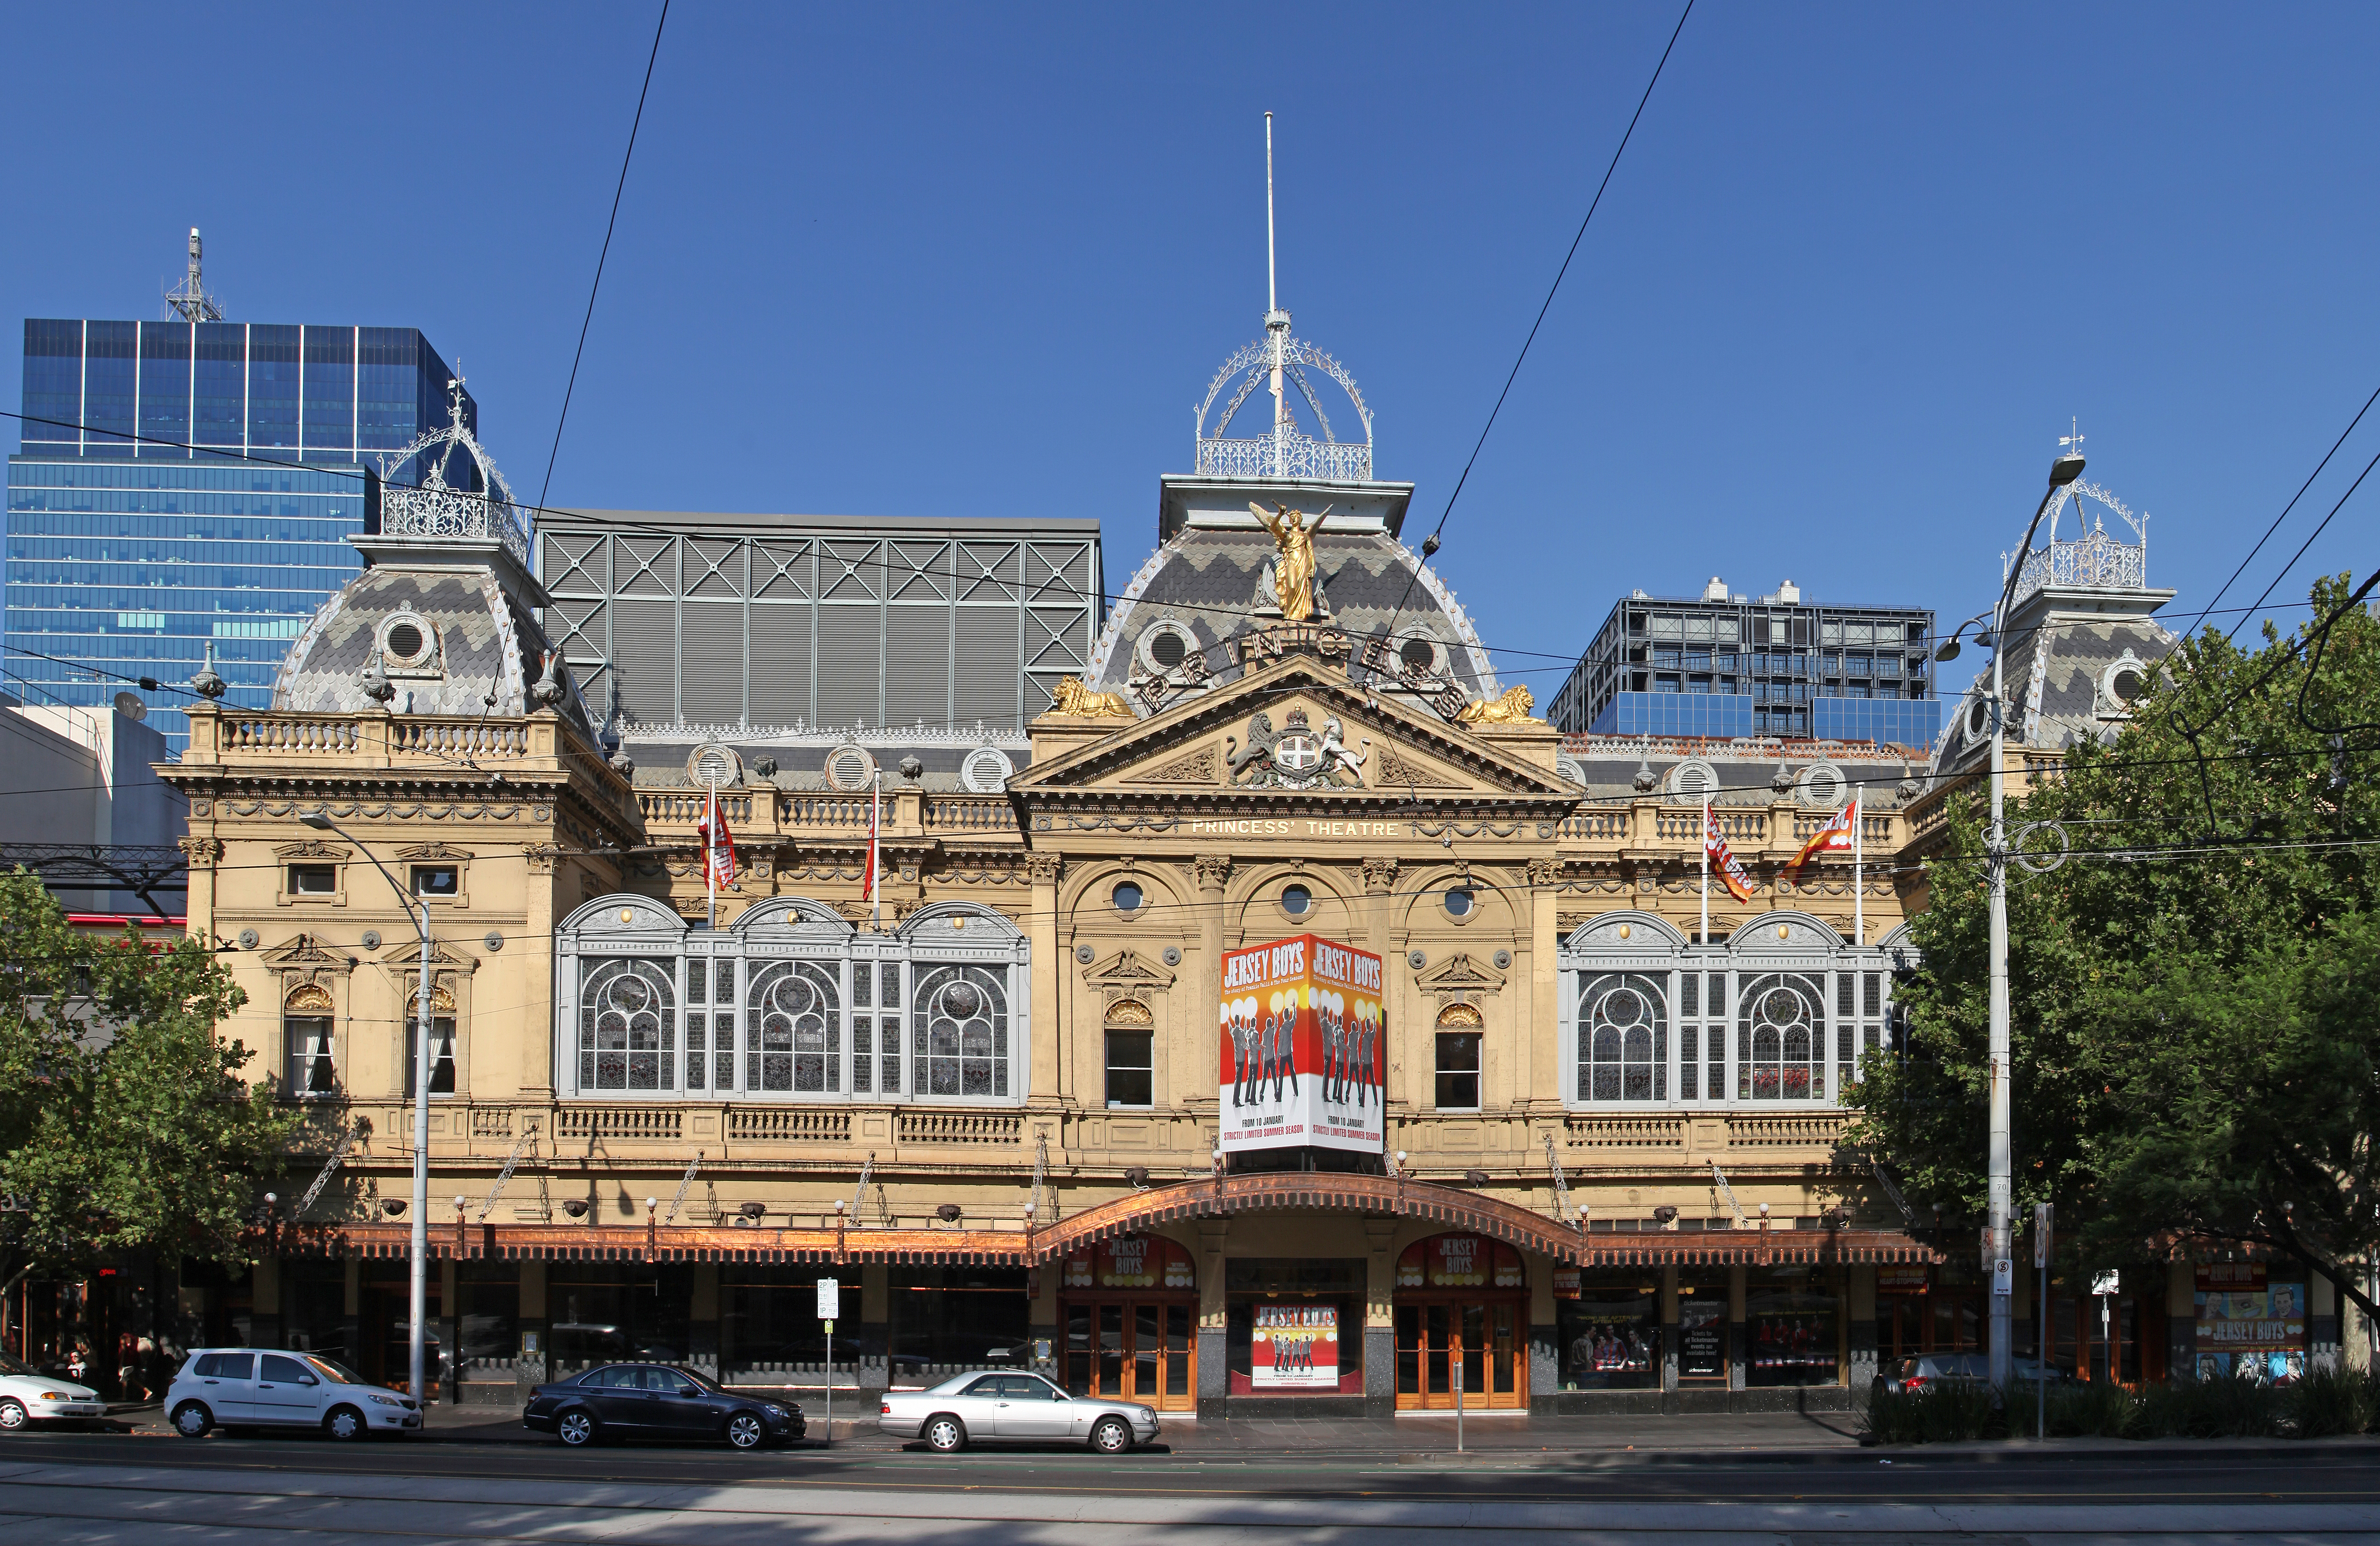 February dates in Melbourne